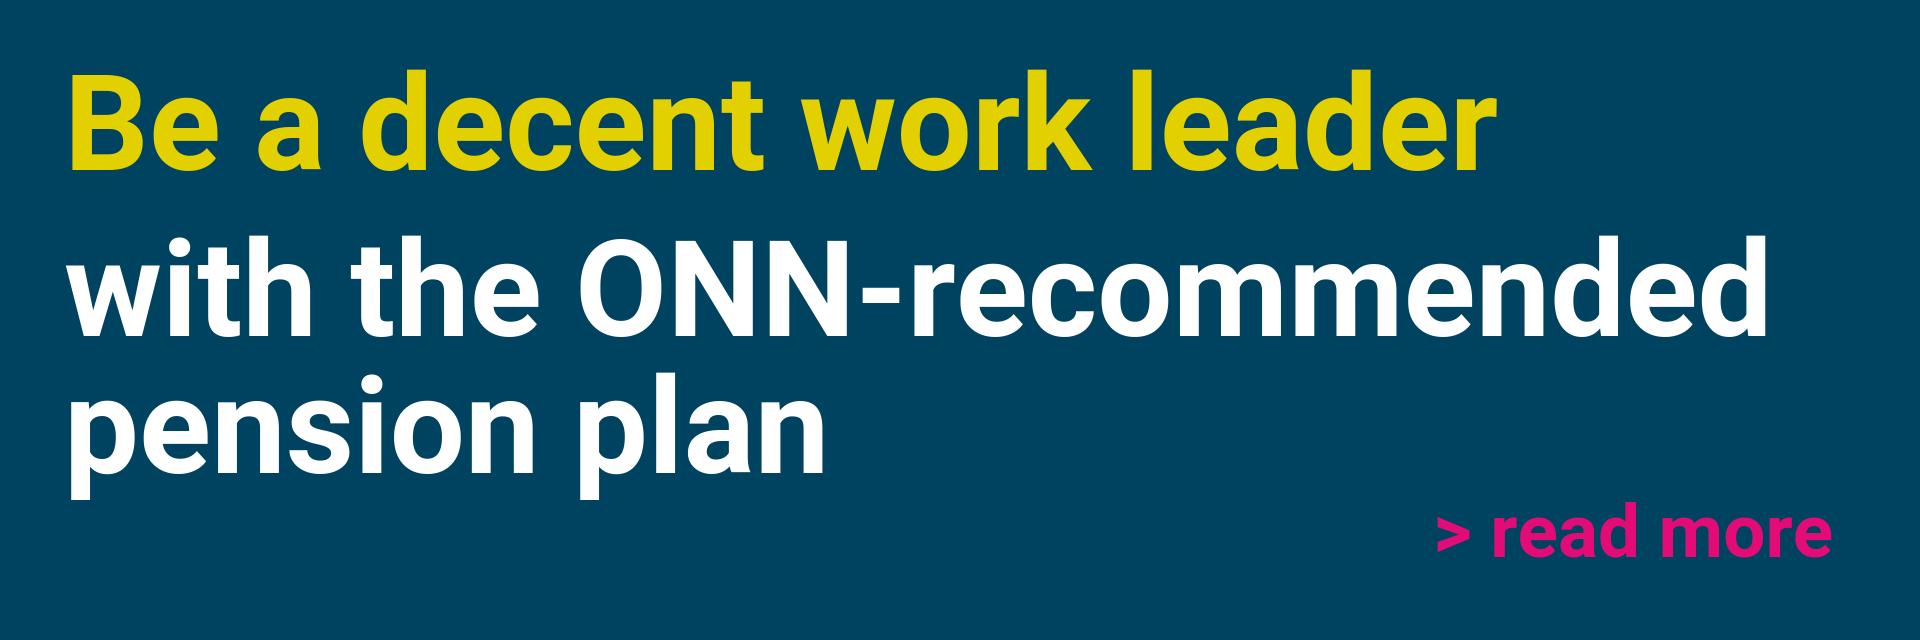 decent-work-pension-banner